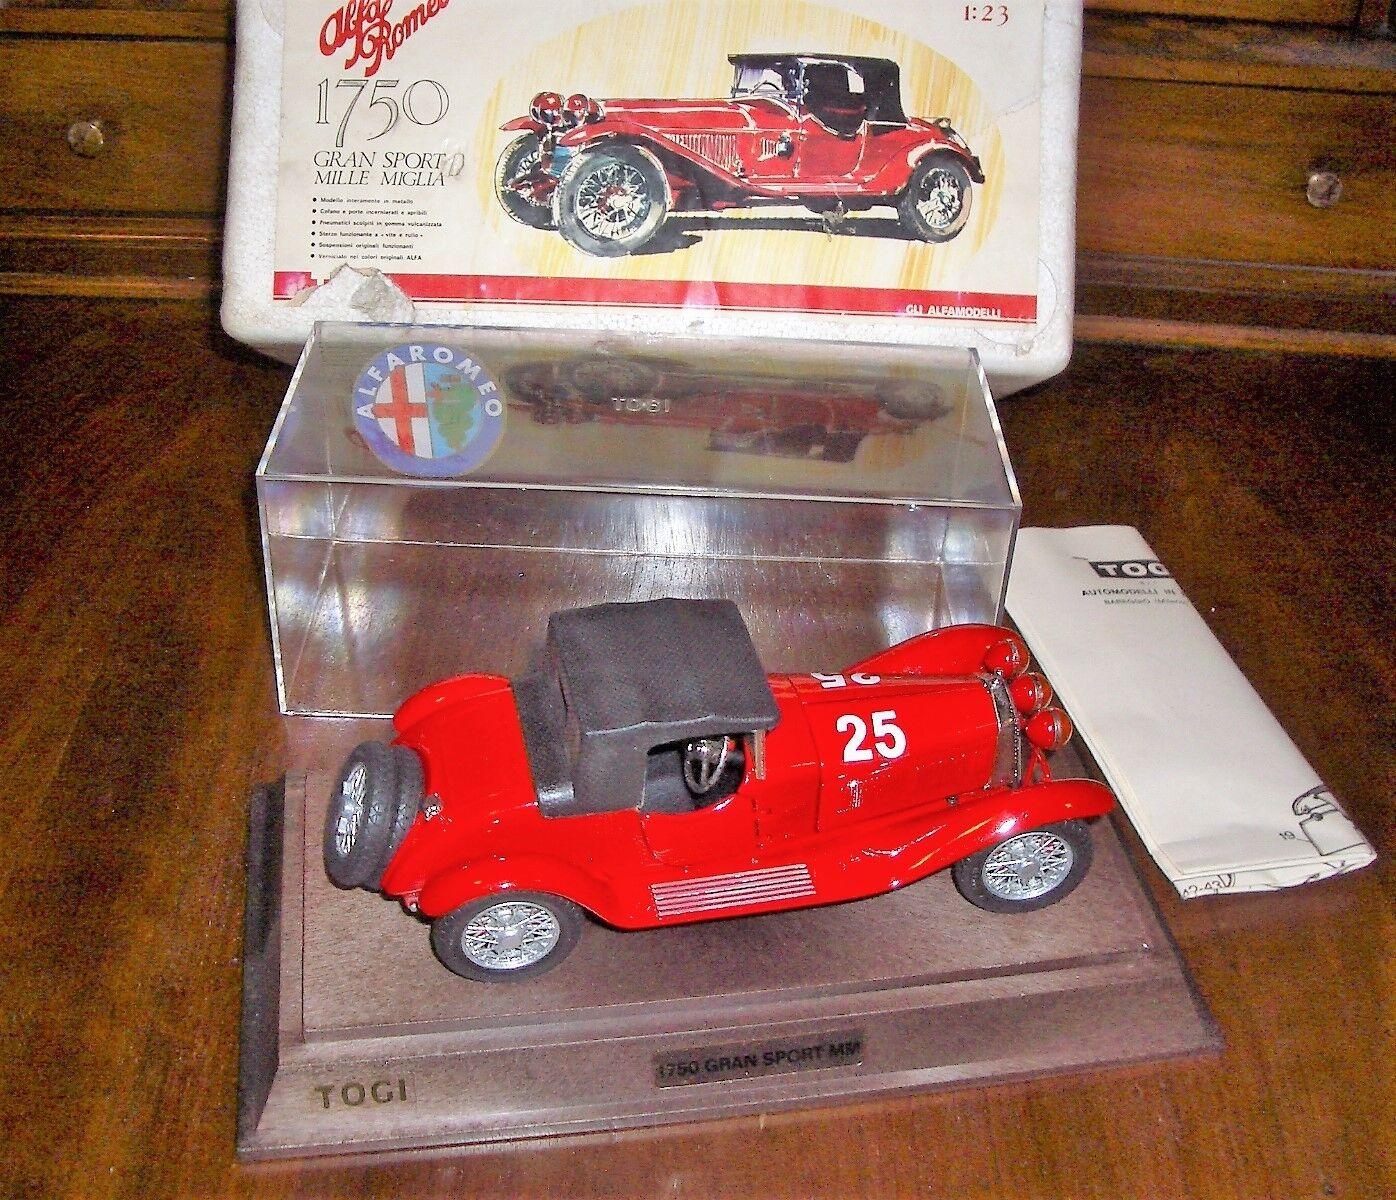 1 23 TOGI Alfa Romeo 1750 Gran Sport Mille Miglia 1930  25 rouge MIB Very Rare